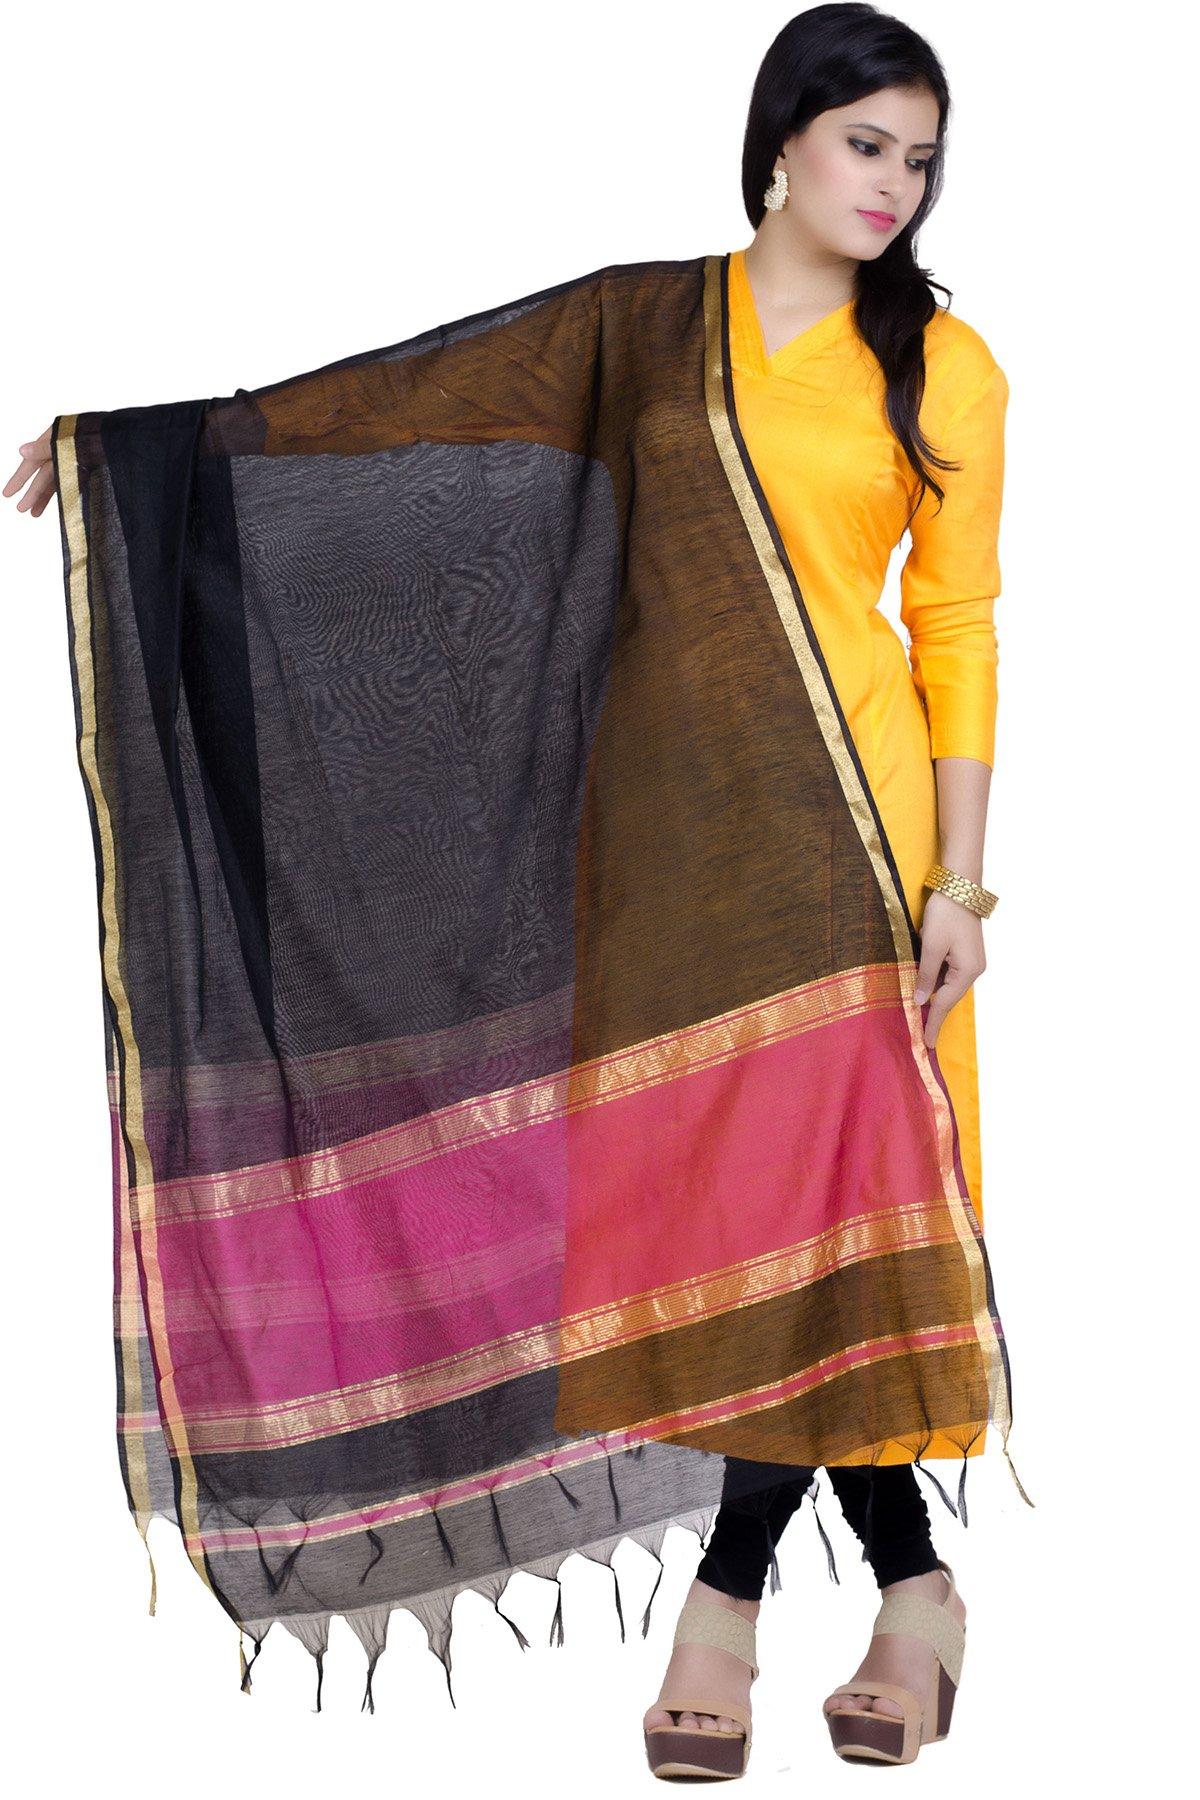 Chandrakala Women's Handwoven Resham work Banarasi Dupatta Stole Scarf (Pink)